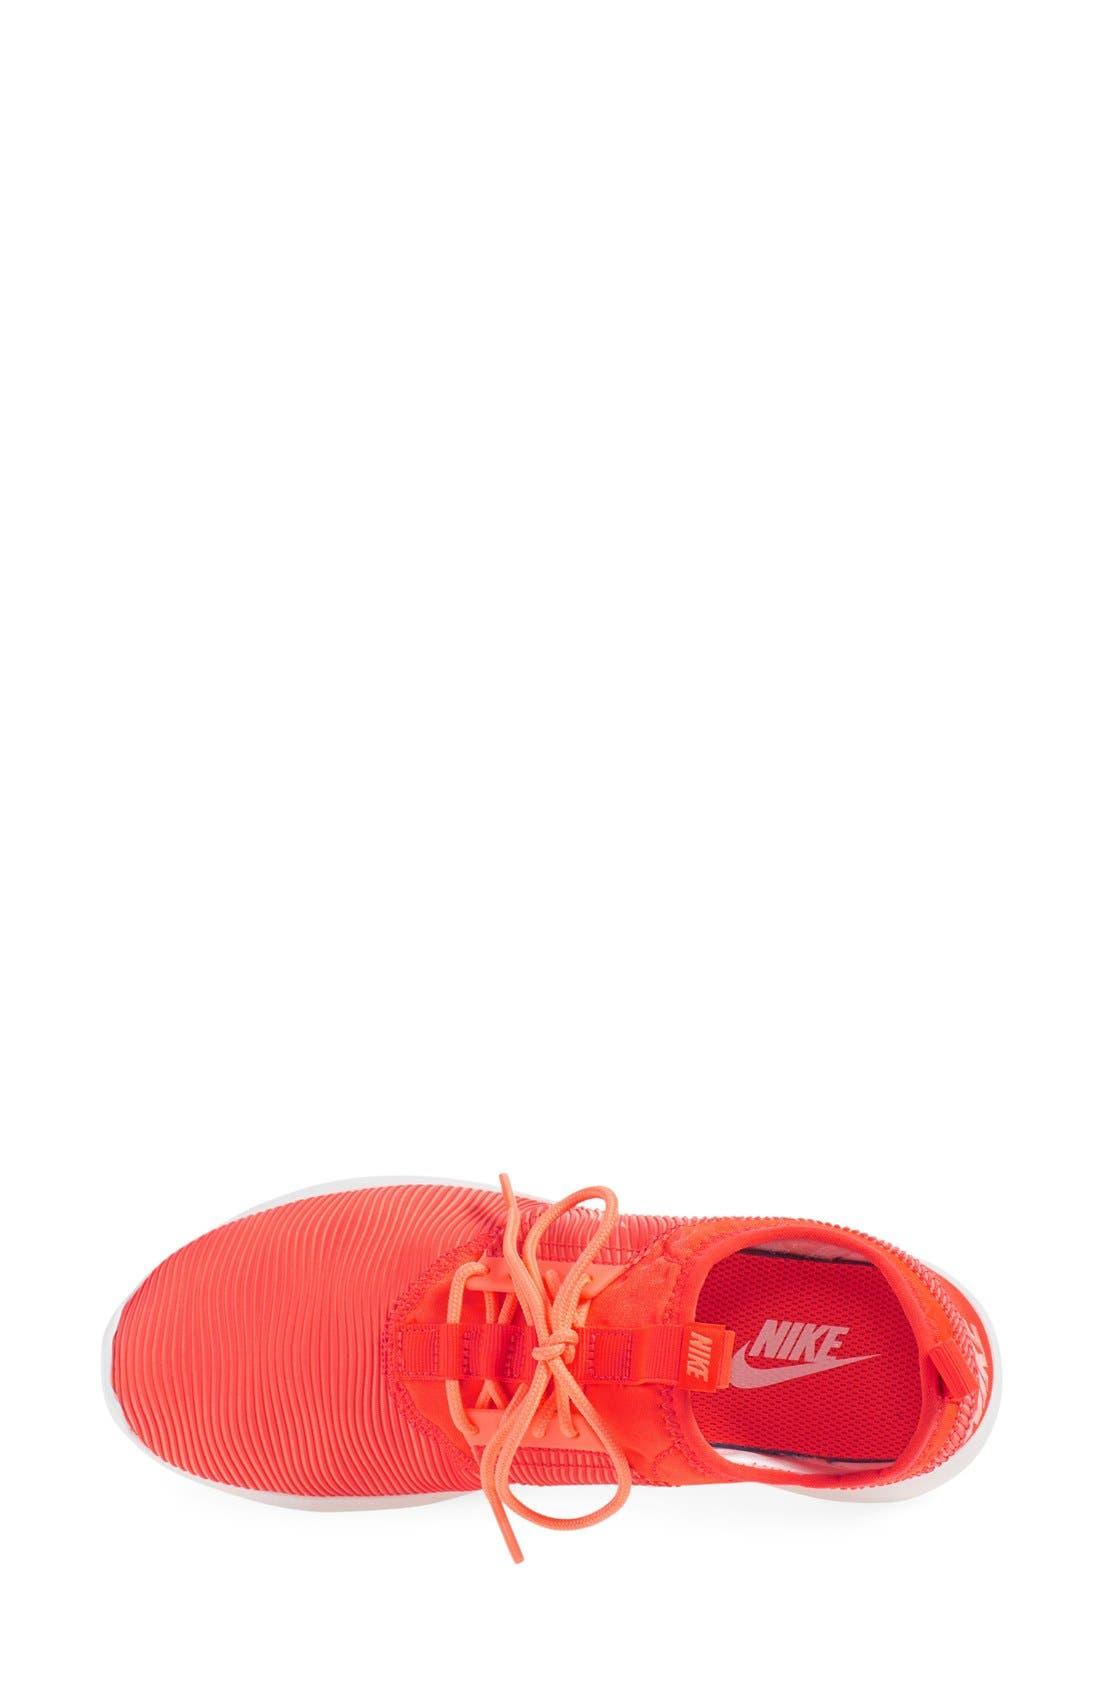 Juvenate Sneaker,                             Alternate thumbnail 161, color,